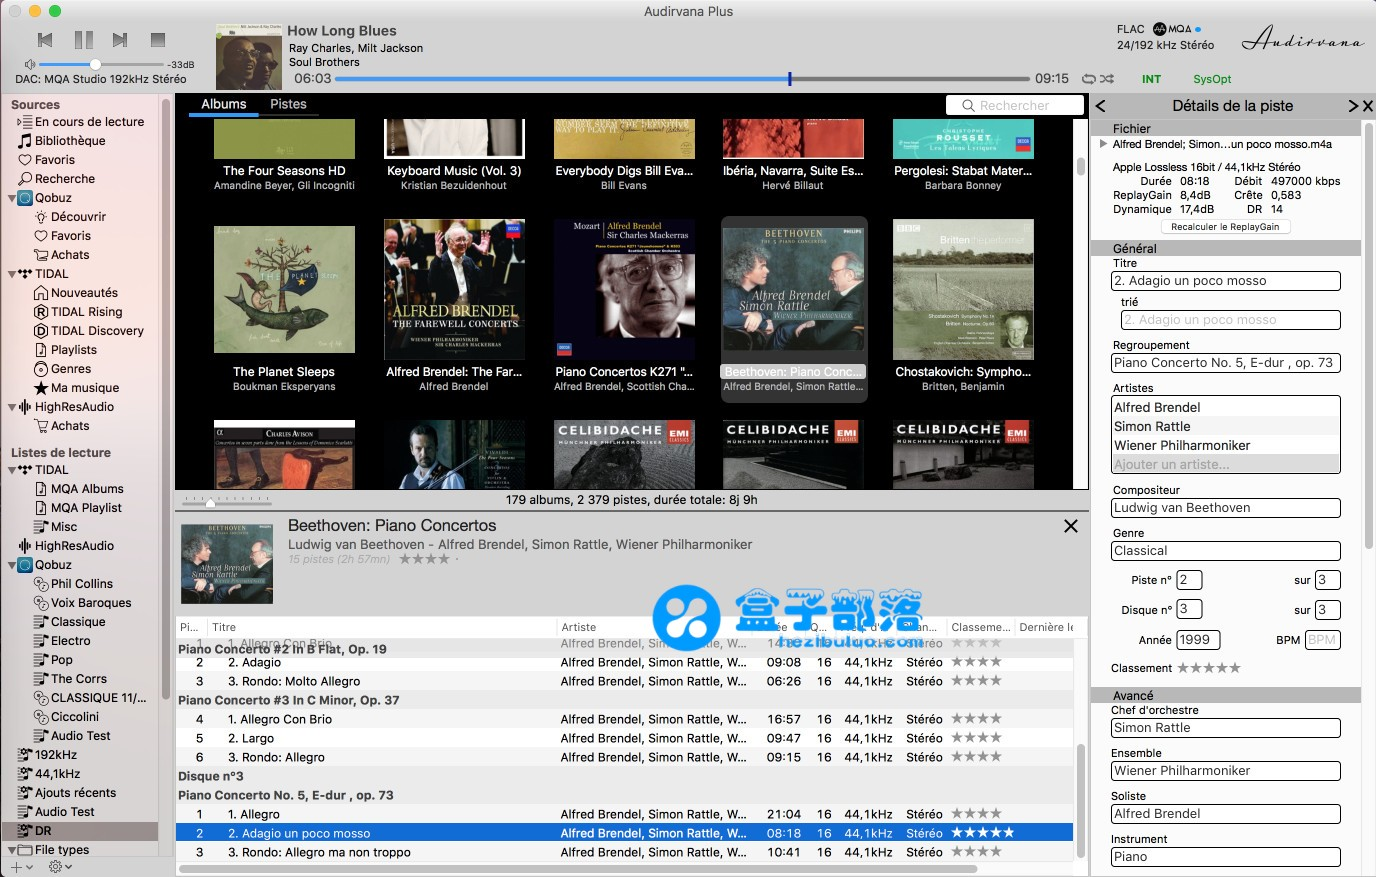 Audirvana Plus for Mac